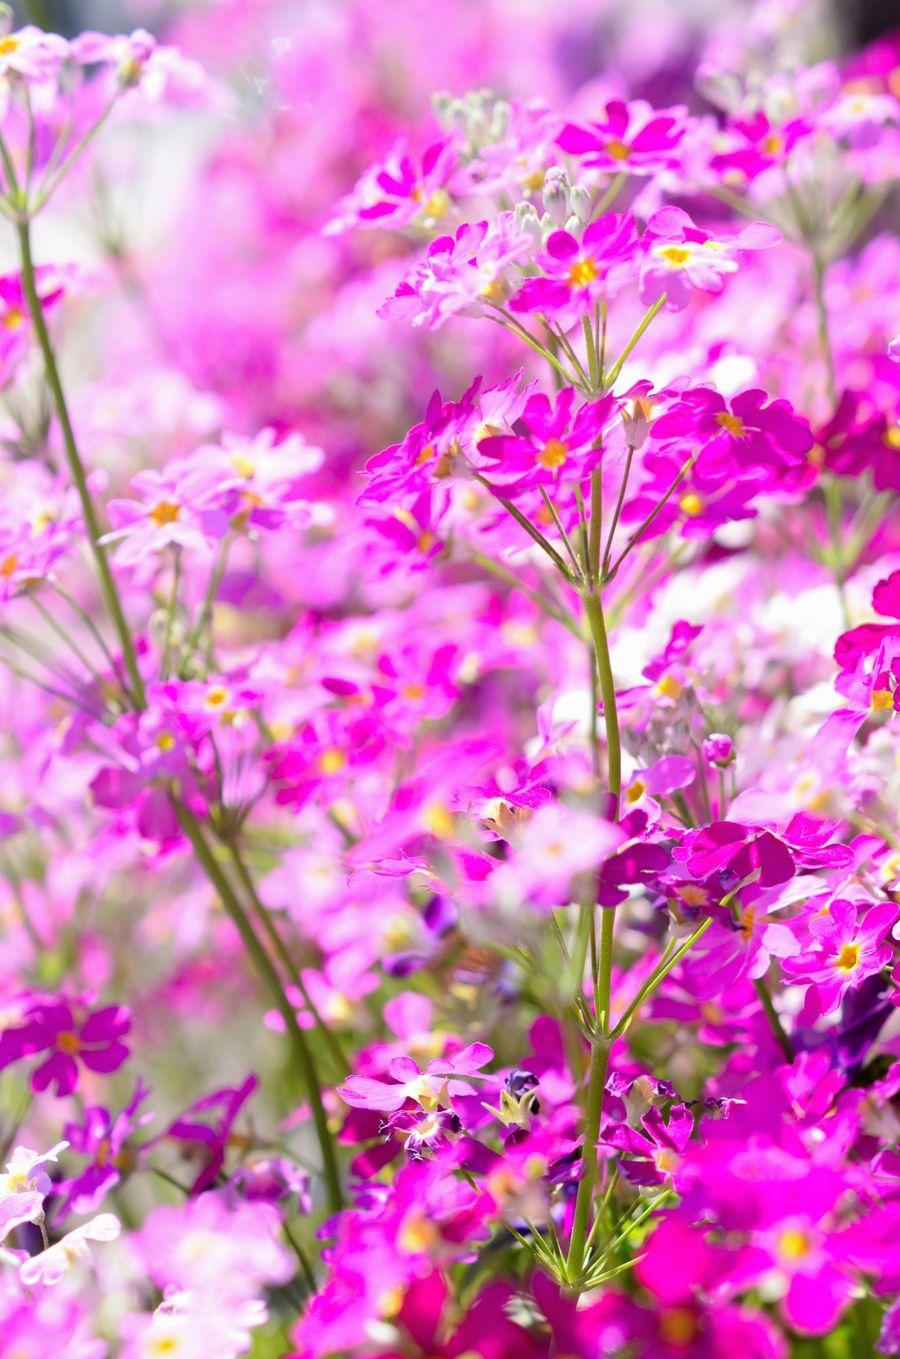 Primrose Pink Flower サクラソウ ピンク 花